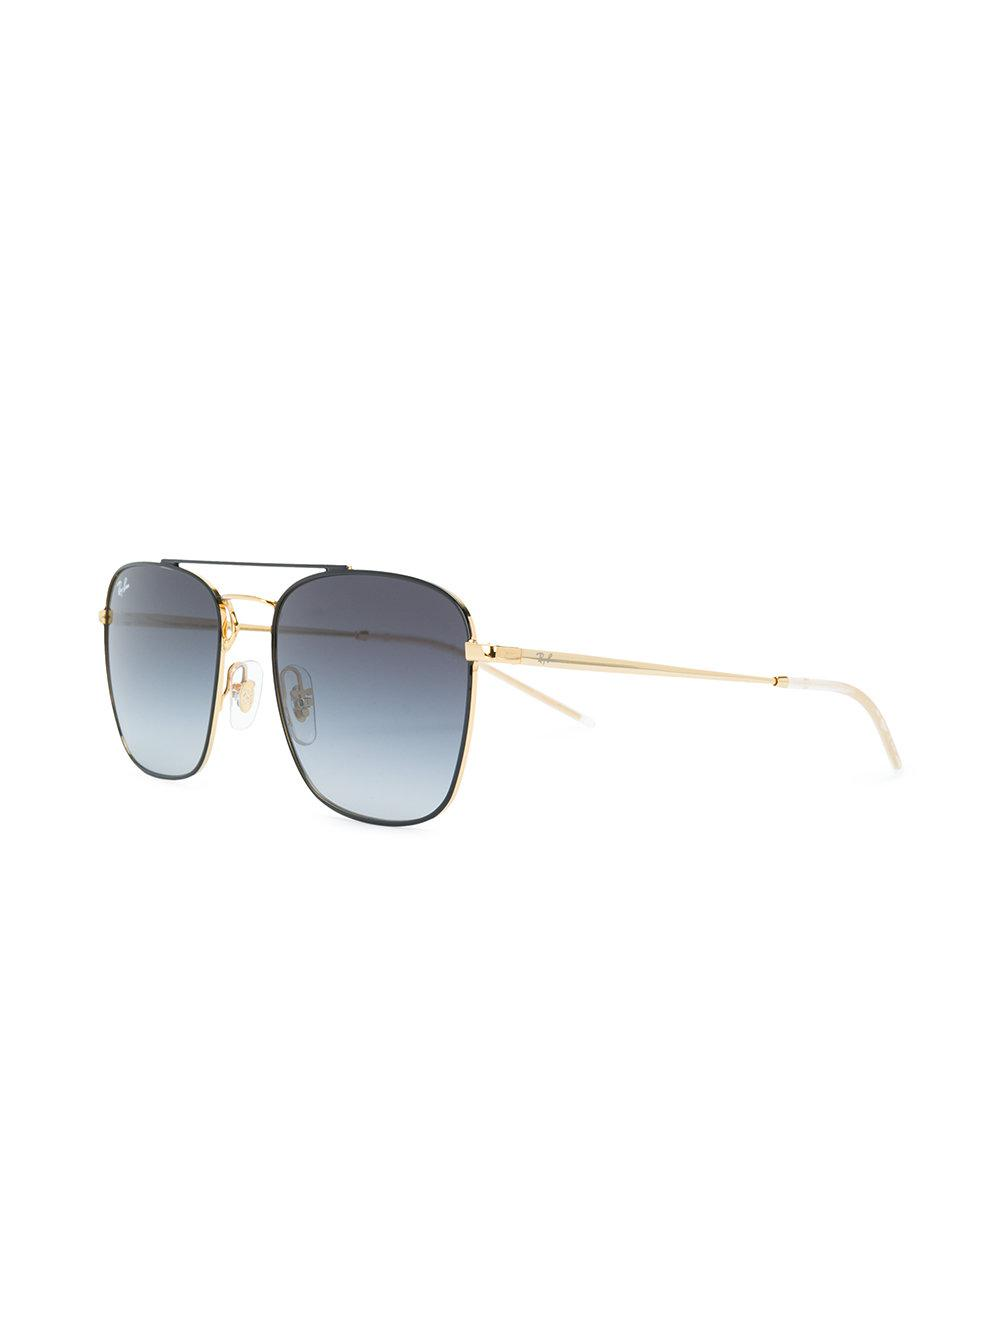 Ray-Ban Aviator Shaped Sunglasses in Metallic for Men